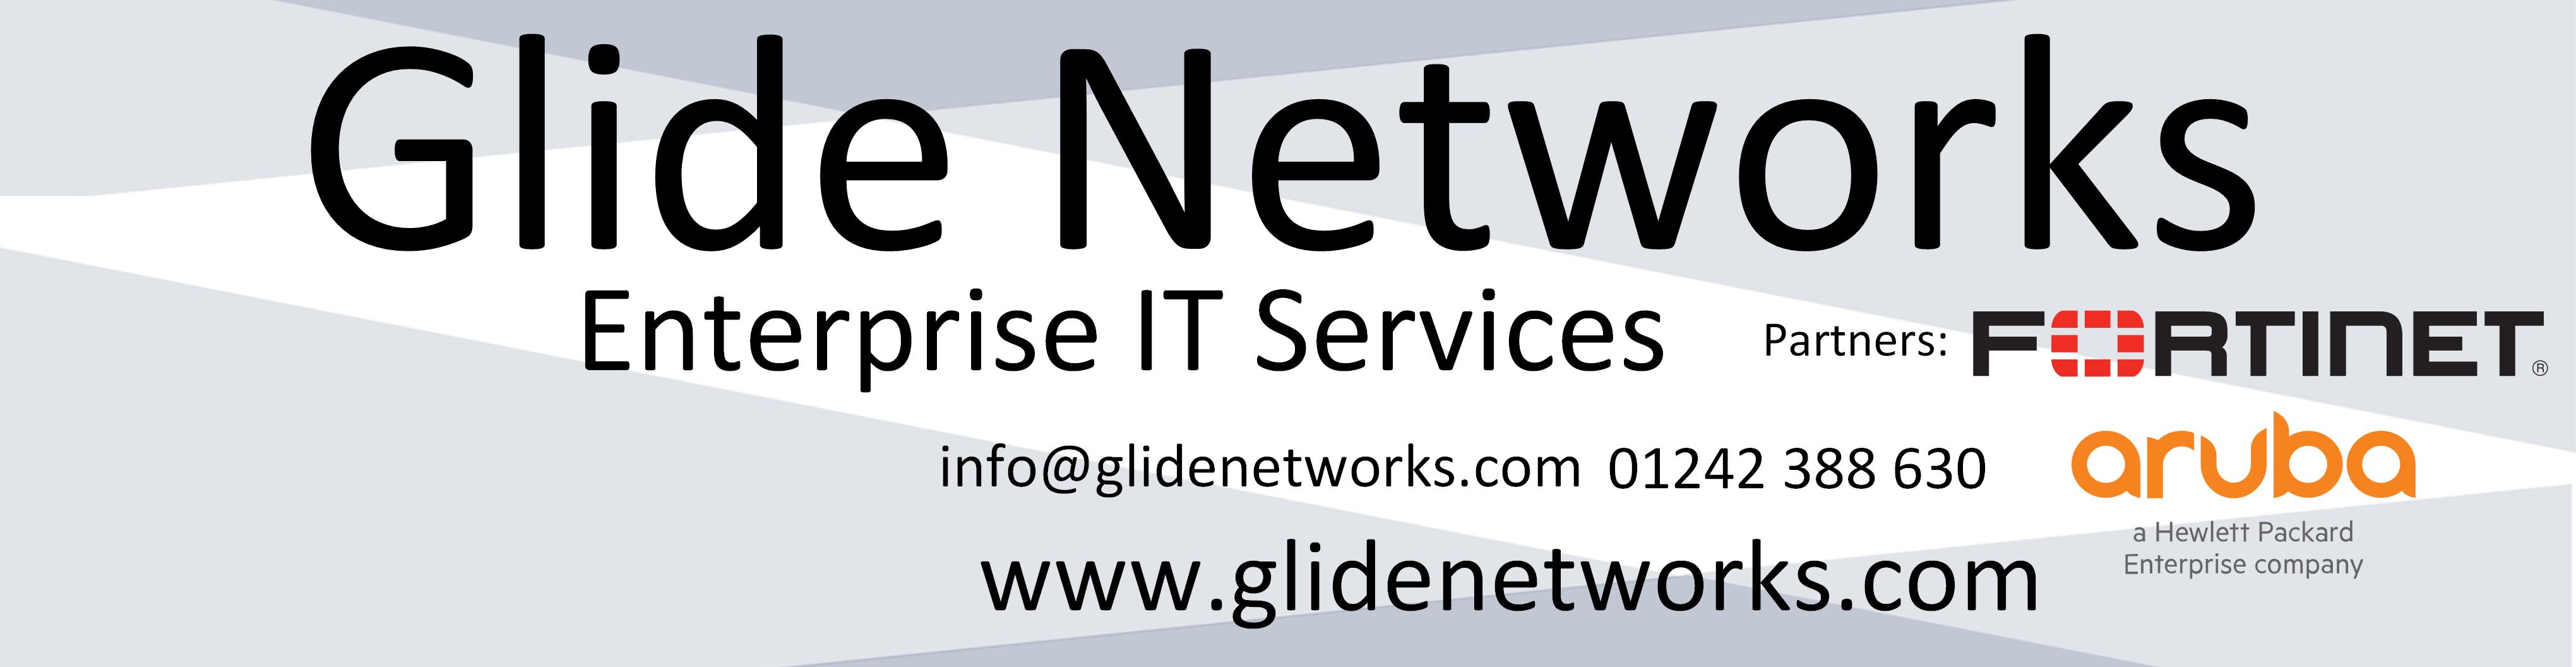 Glide Networks Logo